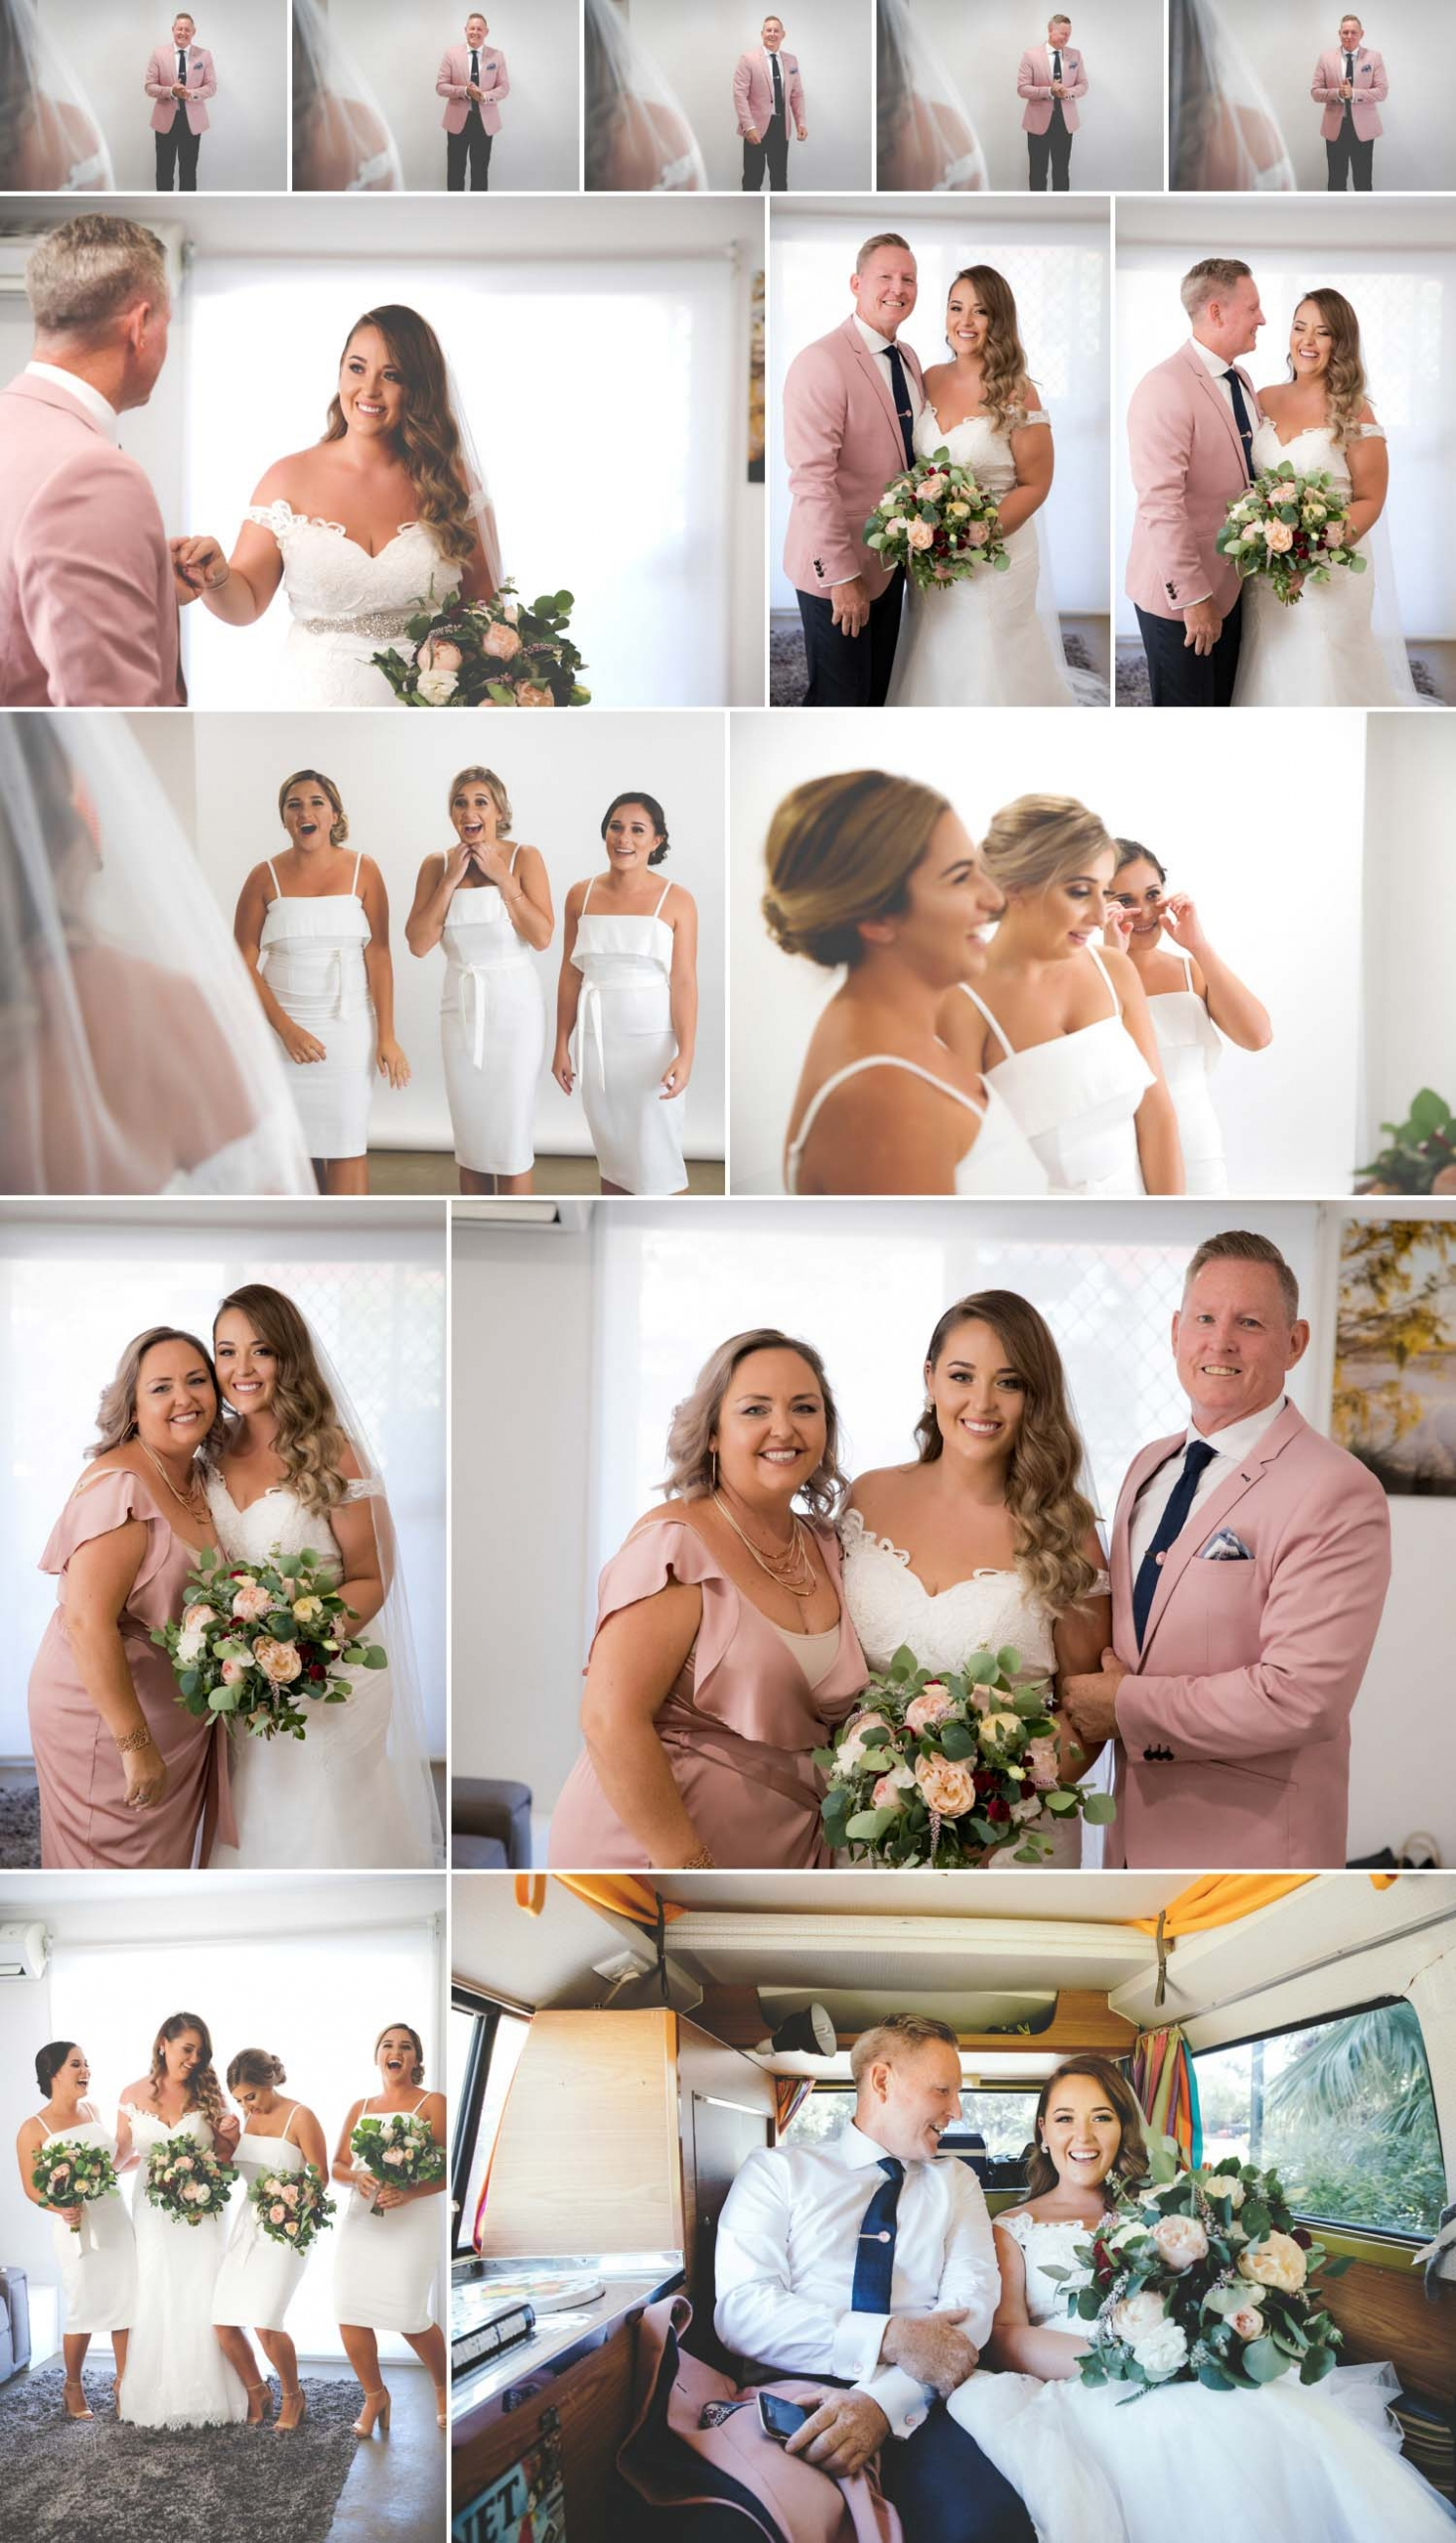 Bride preparation photos for a Gold Coast wedding